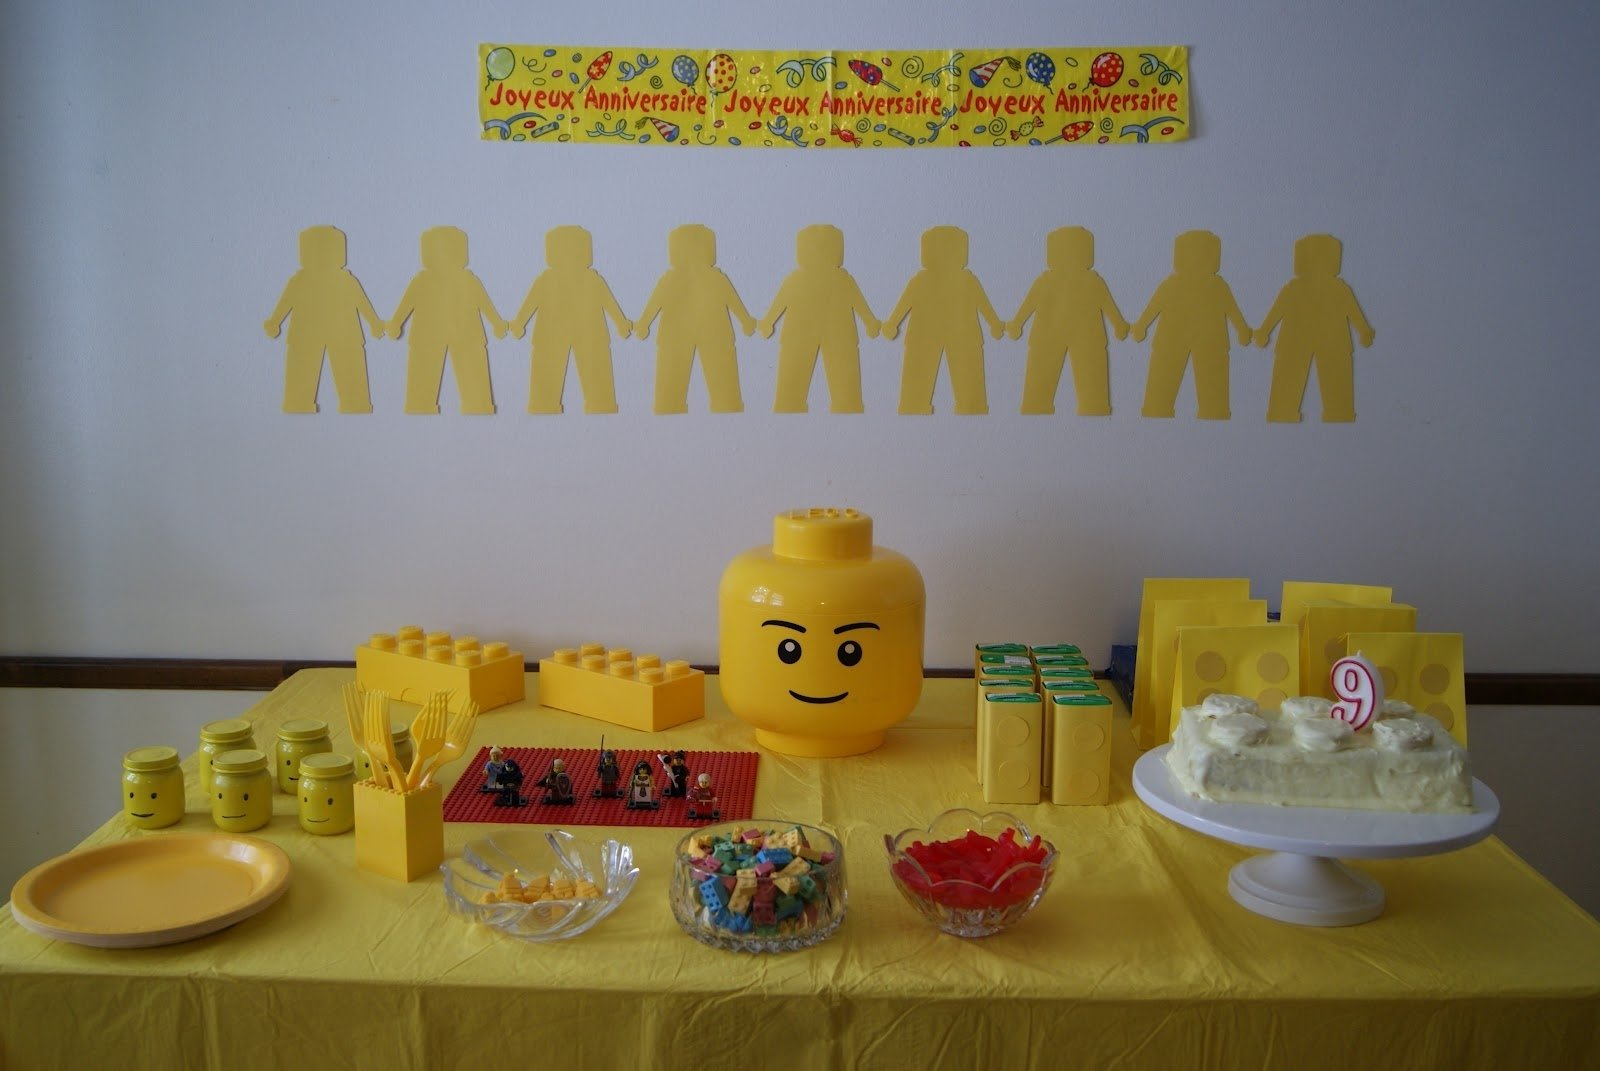 10 Best Birthday Ideas For A 2 Year Old Boy nest full of eggs yellow lego birthday 8